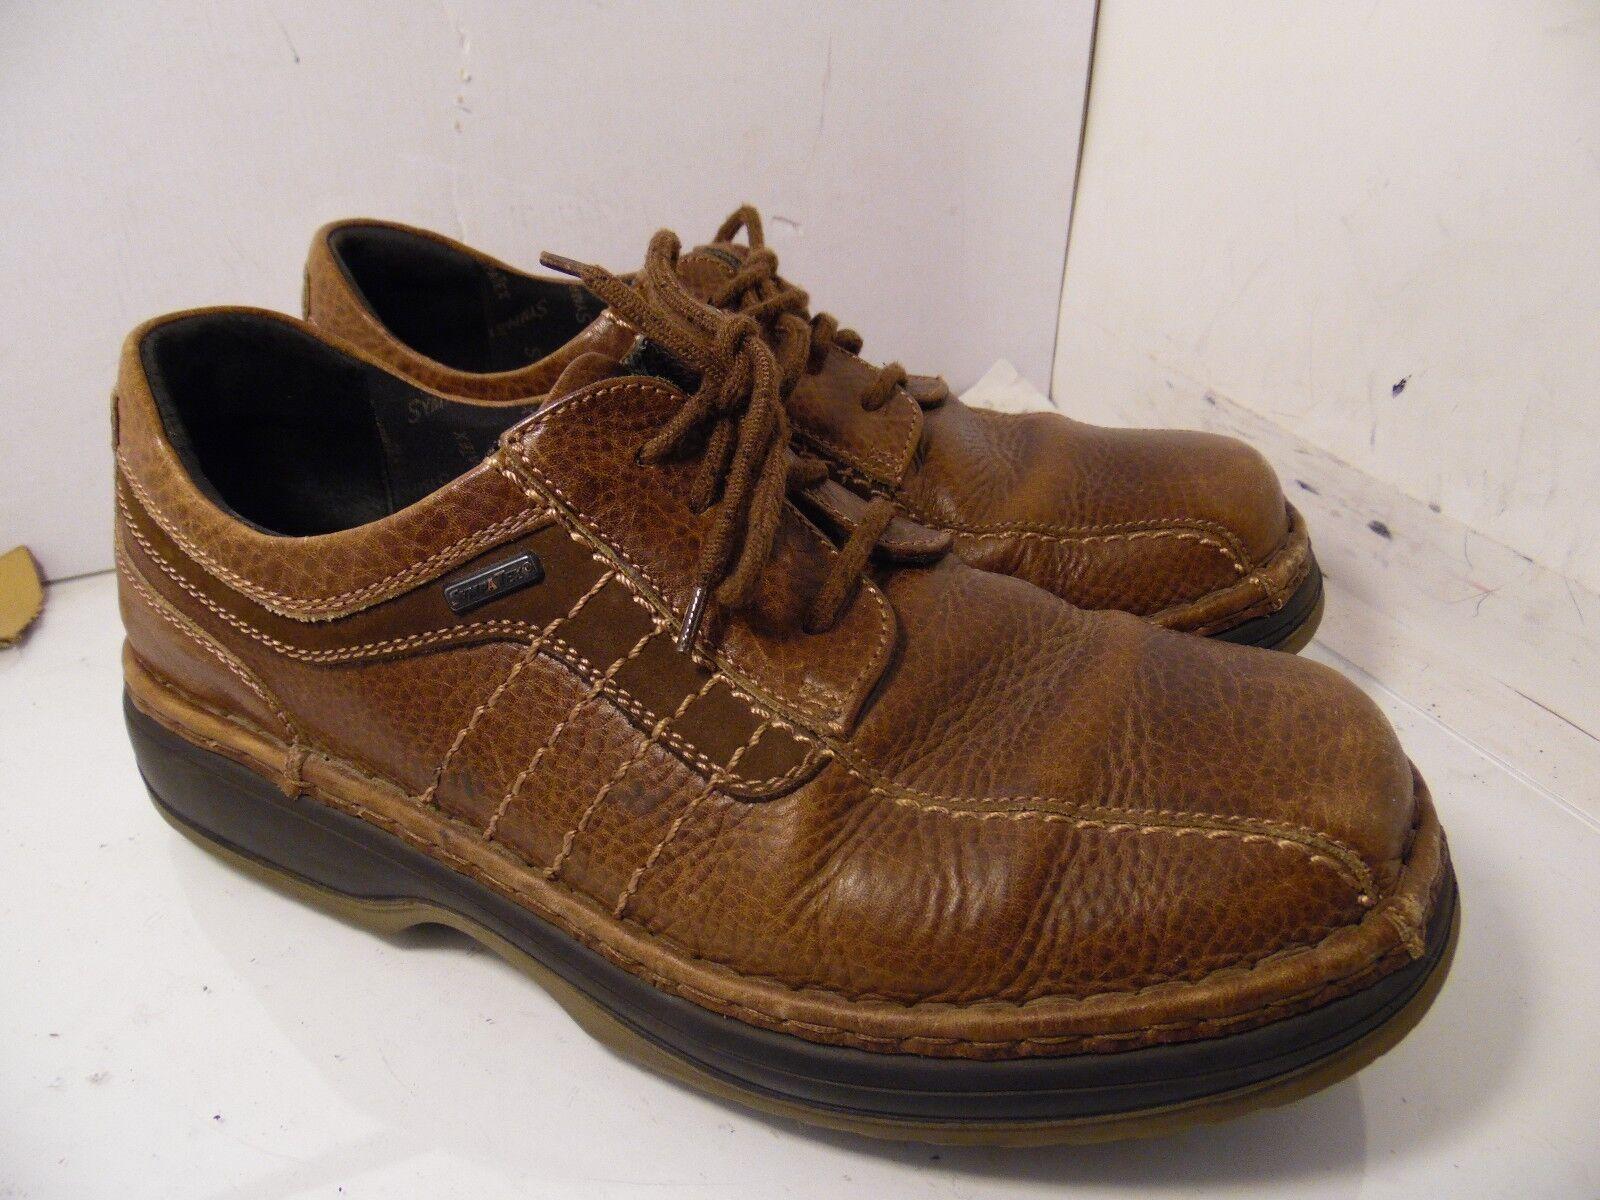 JOSEF SEIBEL Sympatex Brown Leather Casual Oxfords Comfort Walking Mens Size 44